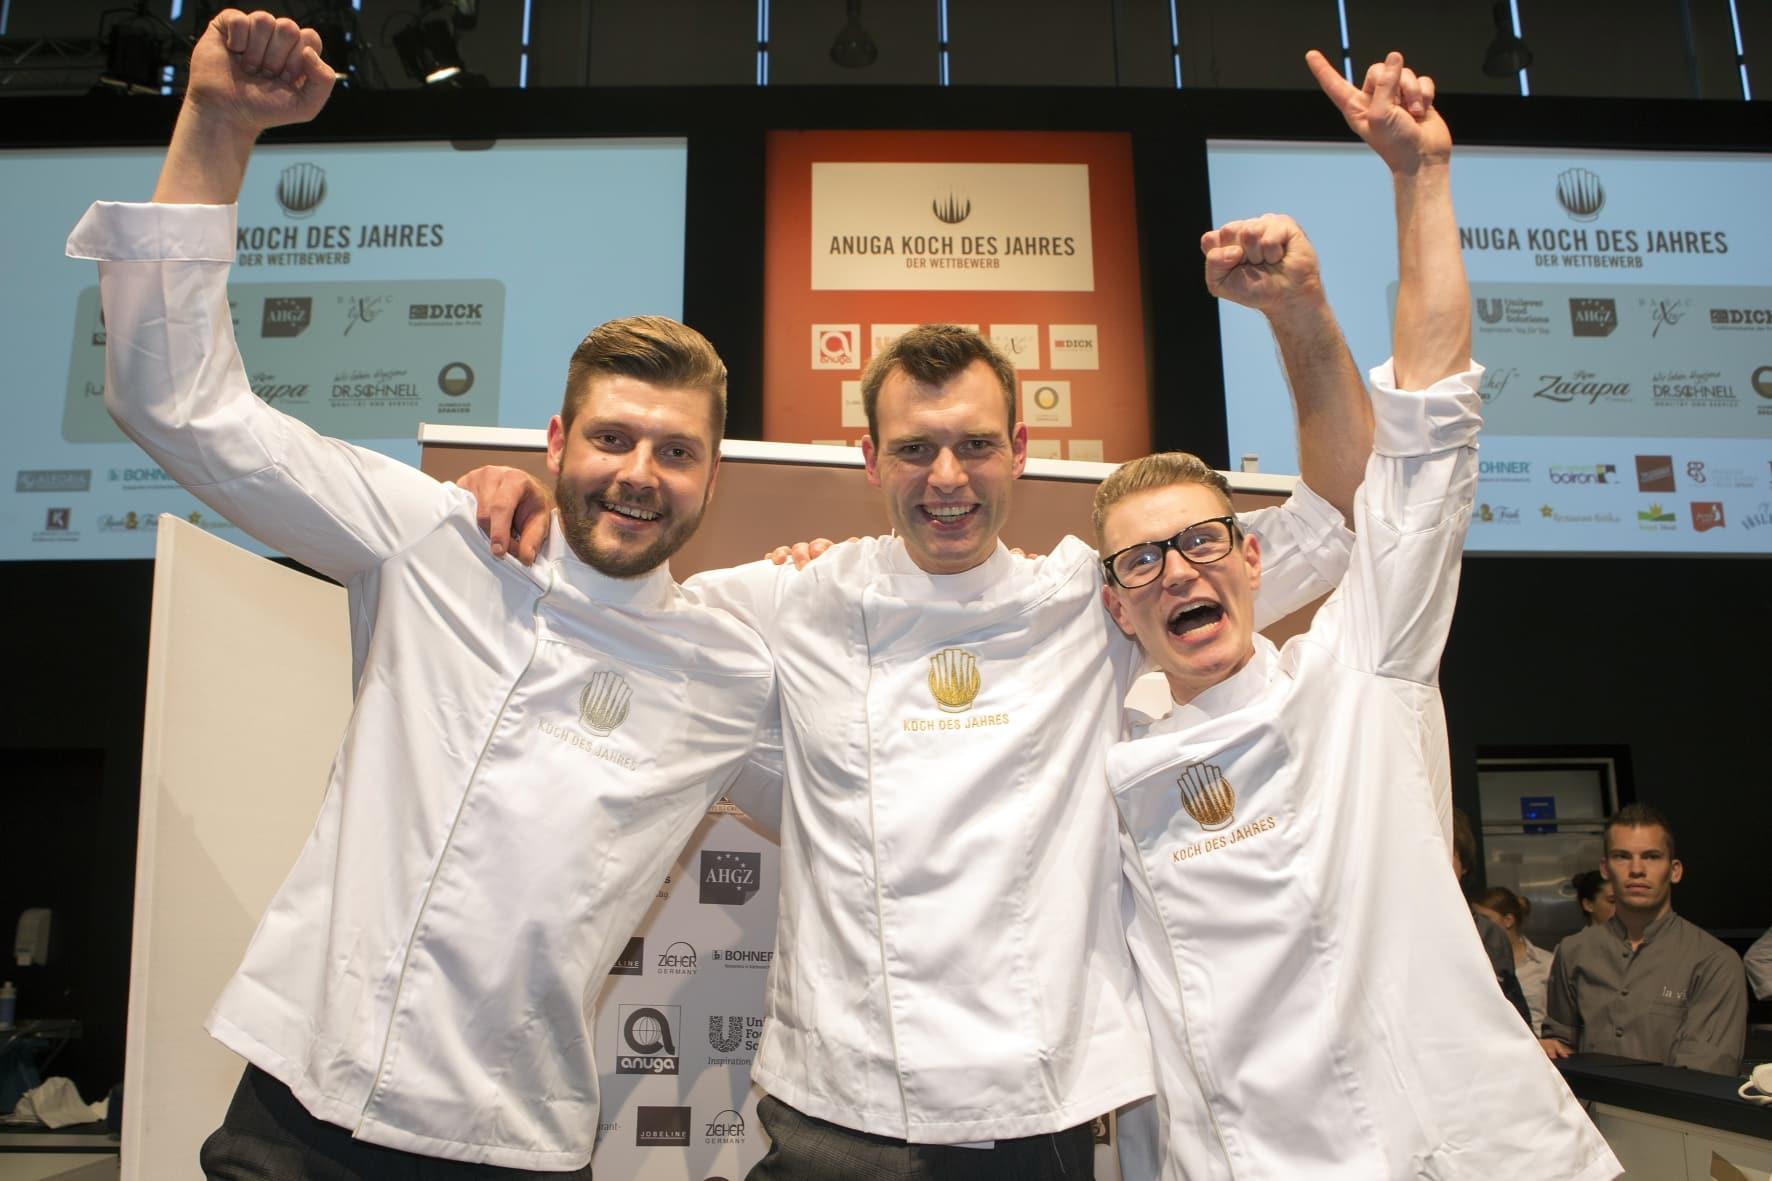 koch des jahres | catering management, Modern dekoo